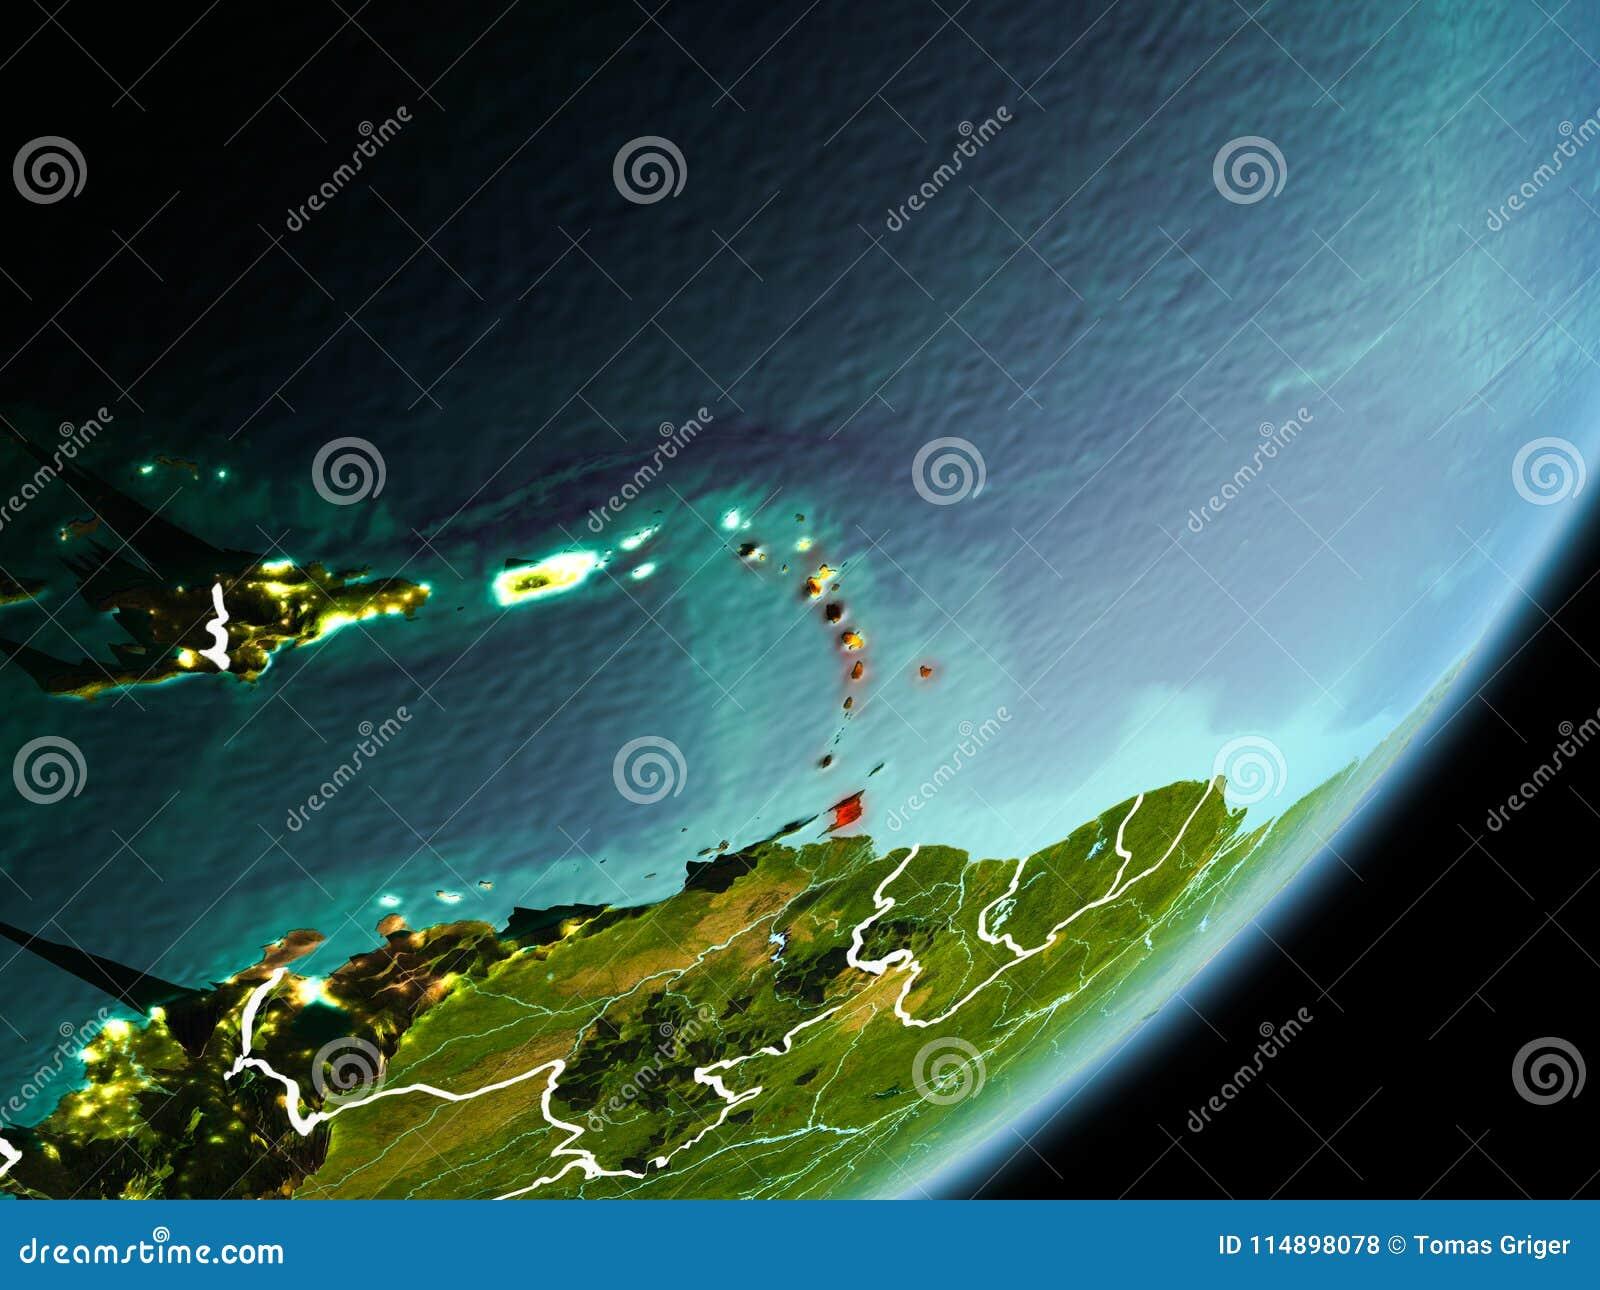 Orbit view of Caribbean